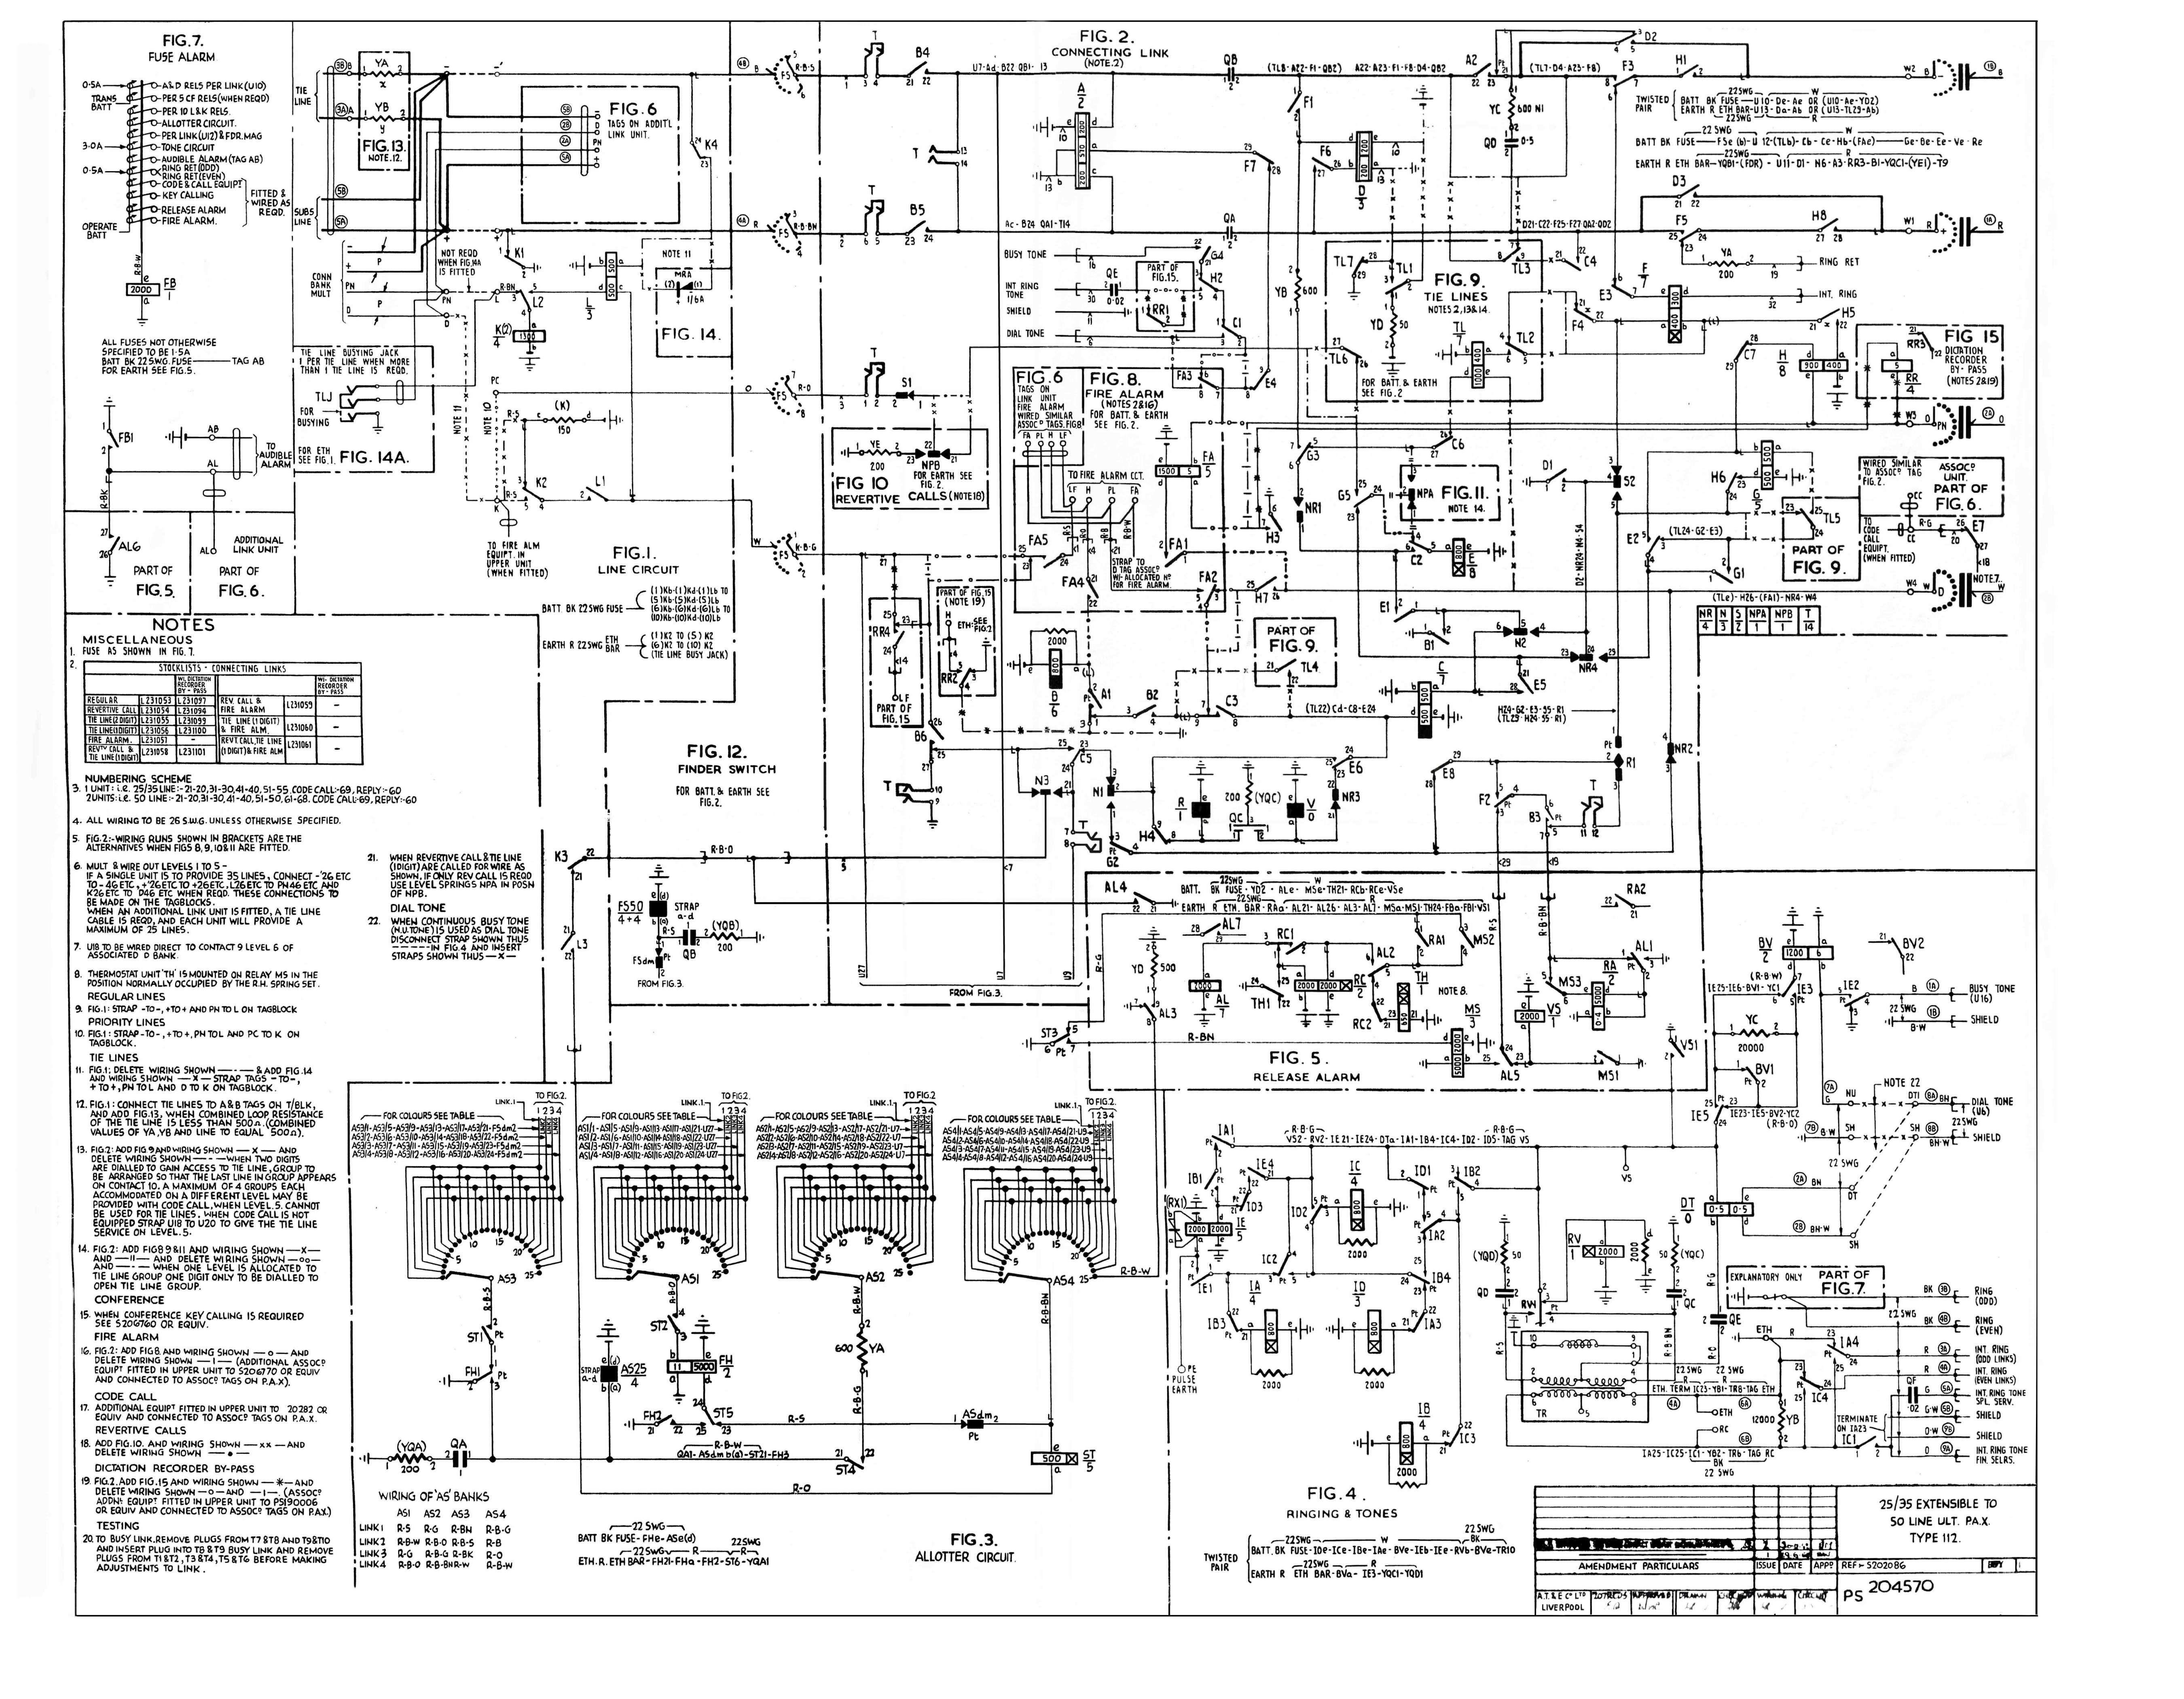 Caterpillar C7 Engine Wiring Diagram and Caterpillar C Engine Sensor Diagram    Schematic Diagram en 2020   Diagrama de circuito, Circuito, AutosPinterest